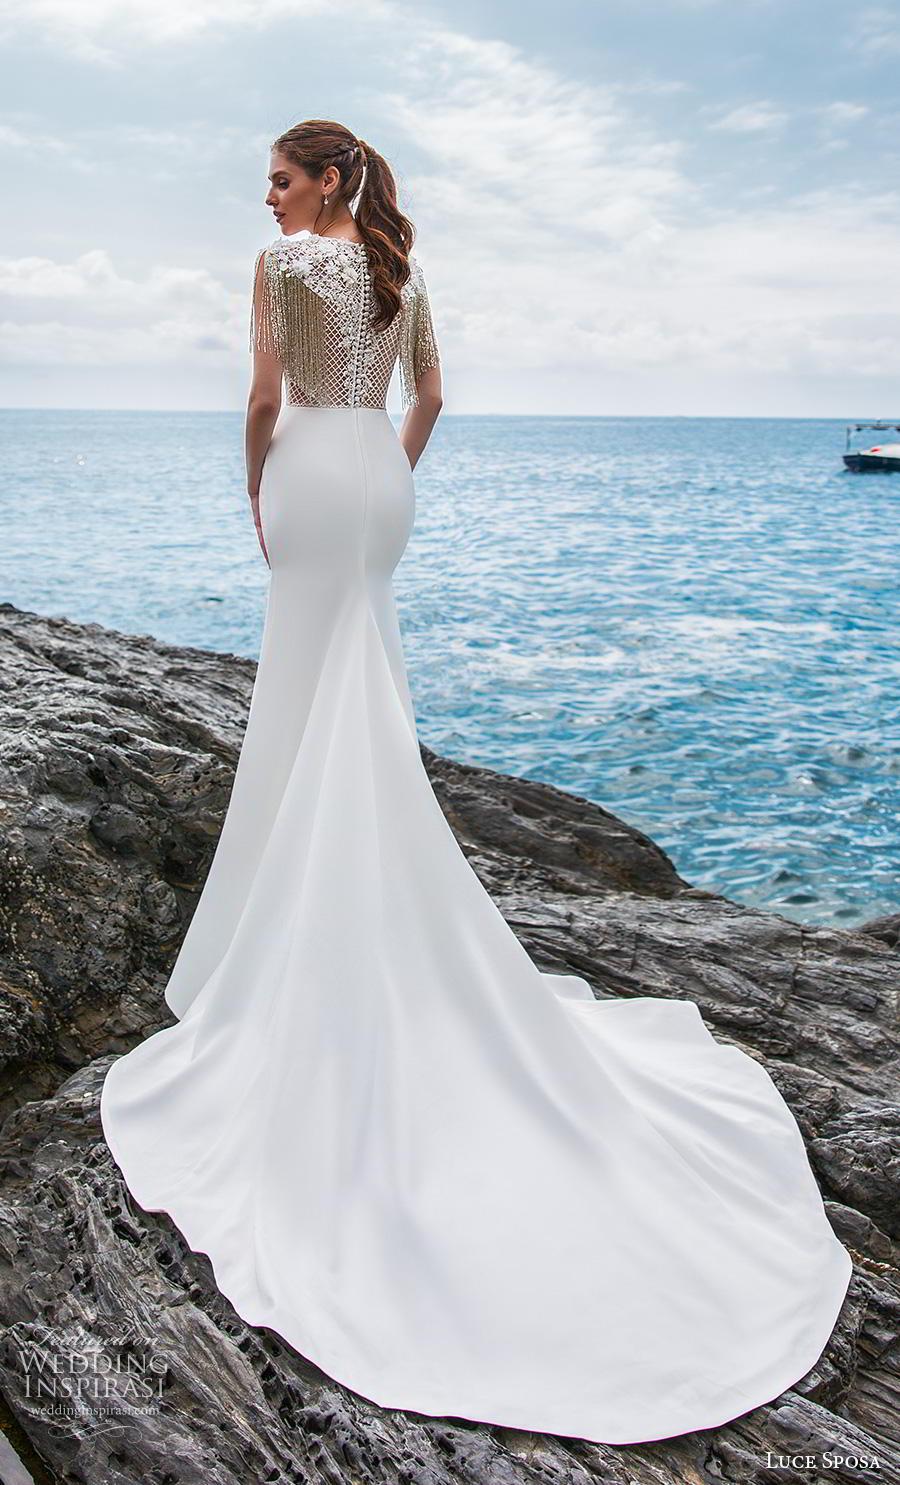 luce sposa 2019 bridal half sleeves jewel neck heavily embellished bodice glitzy elegant fit and flare wedding dress lace back chapel train (11) bv